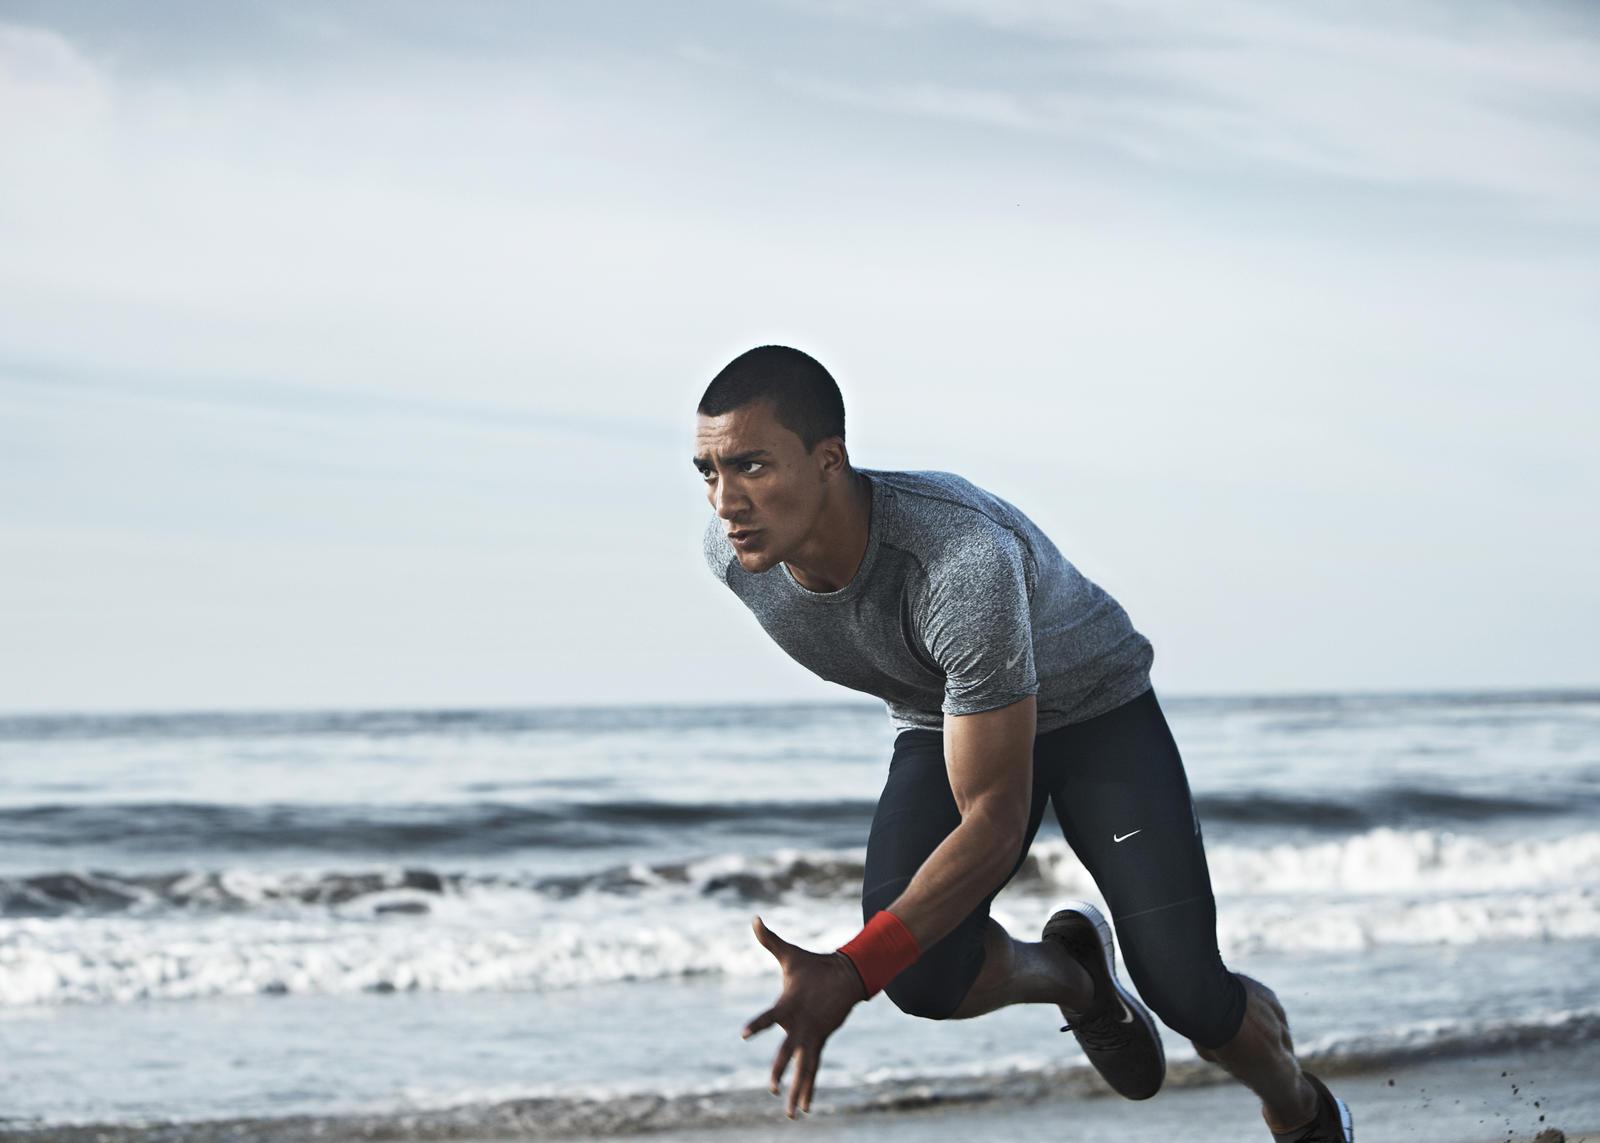 Fitness Girl Wallpaper Hd Nike Apparel Technologies Help Athletes Maintain Optimal